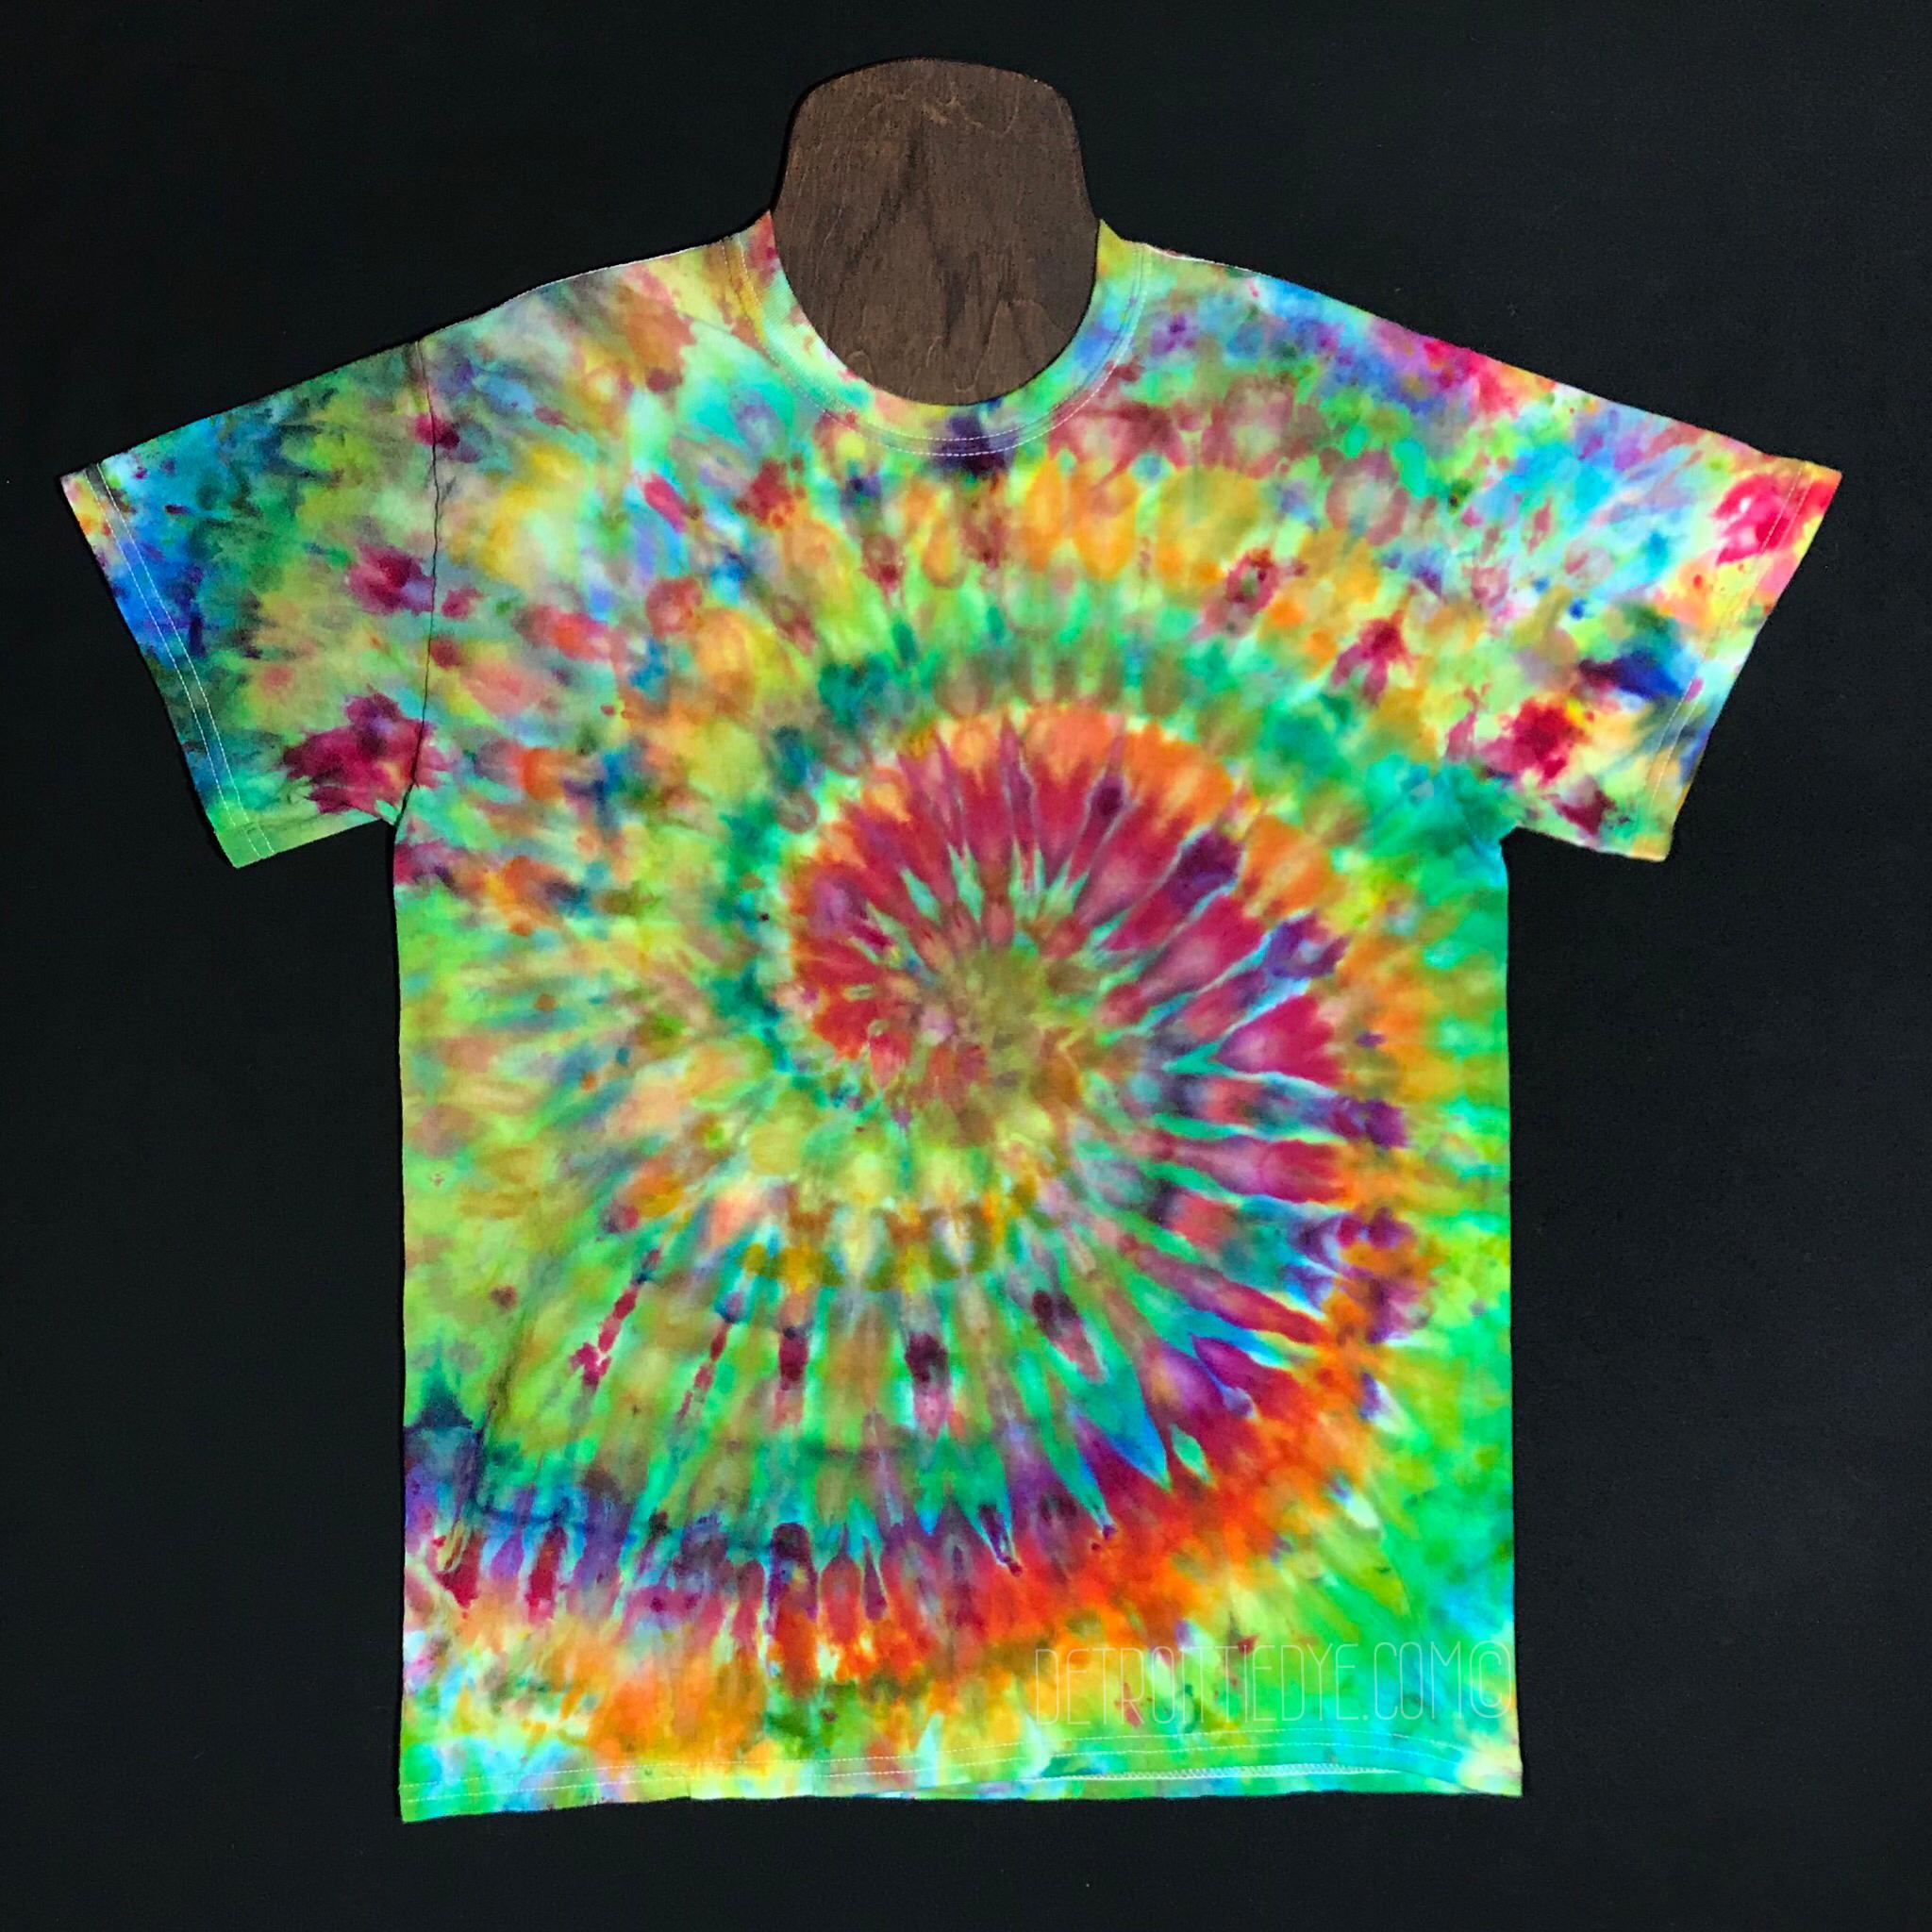 Ice Dyed Wave T-Shirt Tie Dye Wave Shirt Rainbow Tie Dye XL Shirt